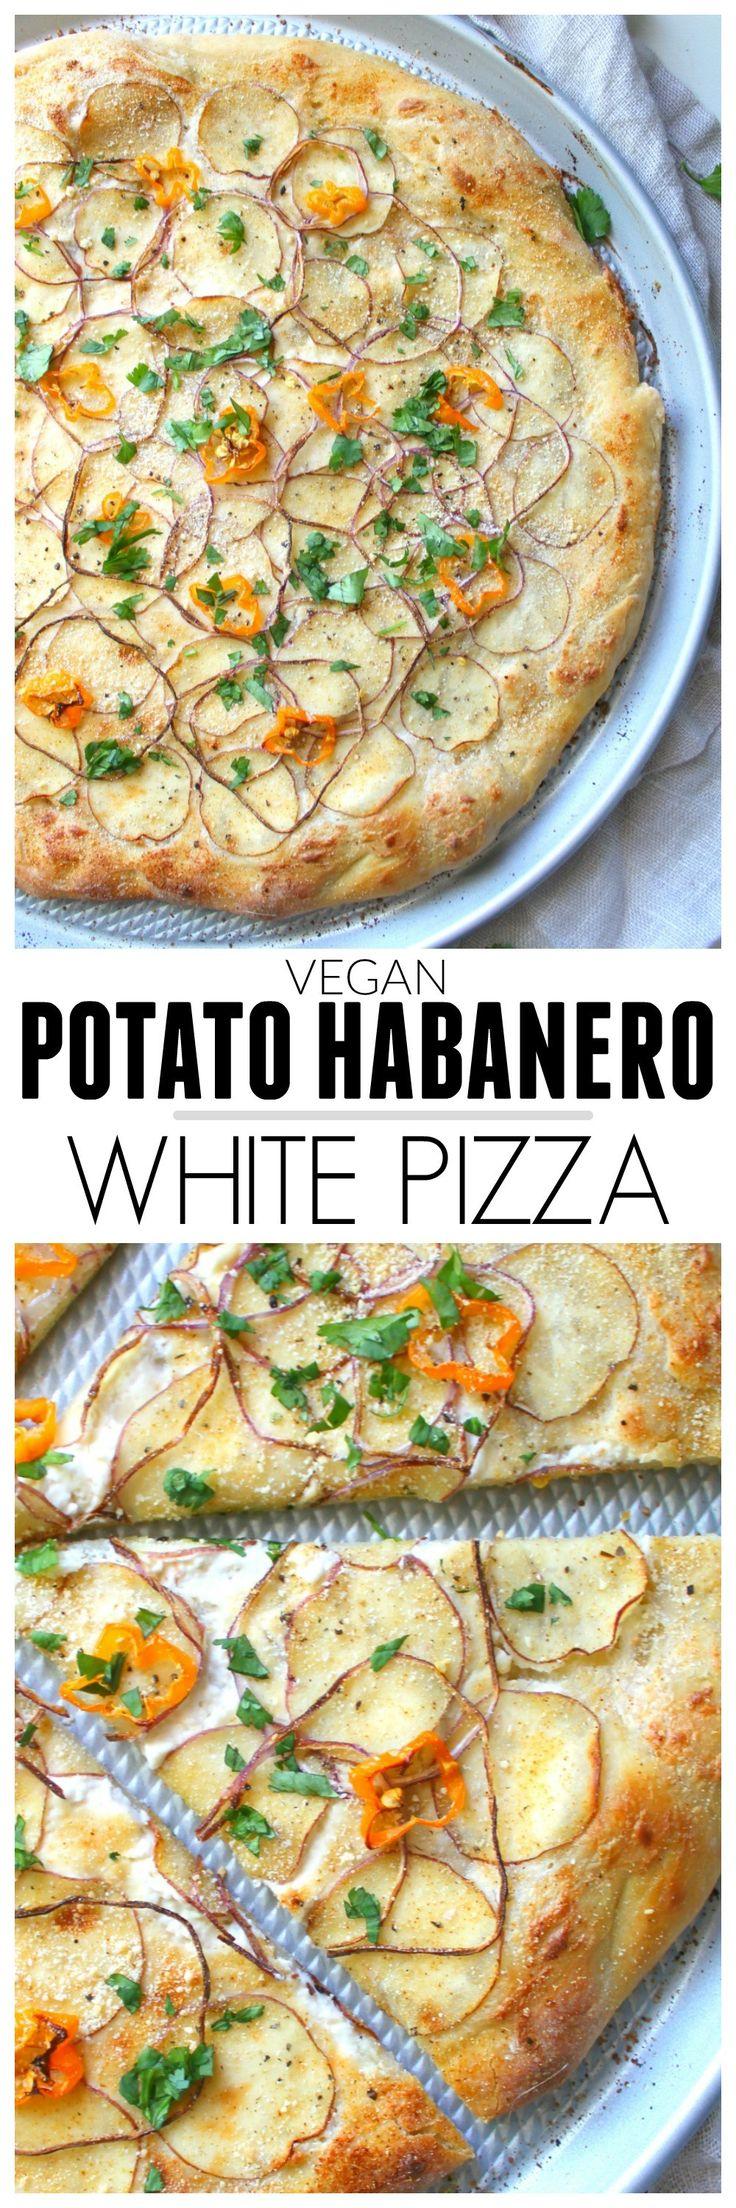 vegan potato habanero white pizza rezept plant based ideas recipes pinterest vegane. Black Bedroom Furniture Sets. Home Design Ideas